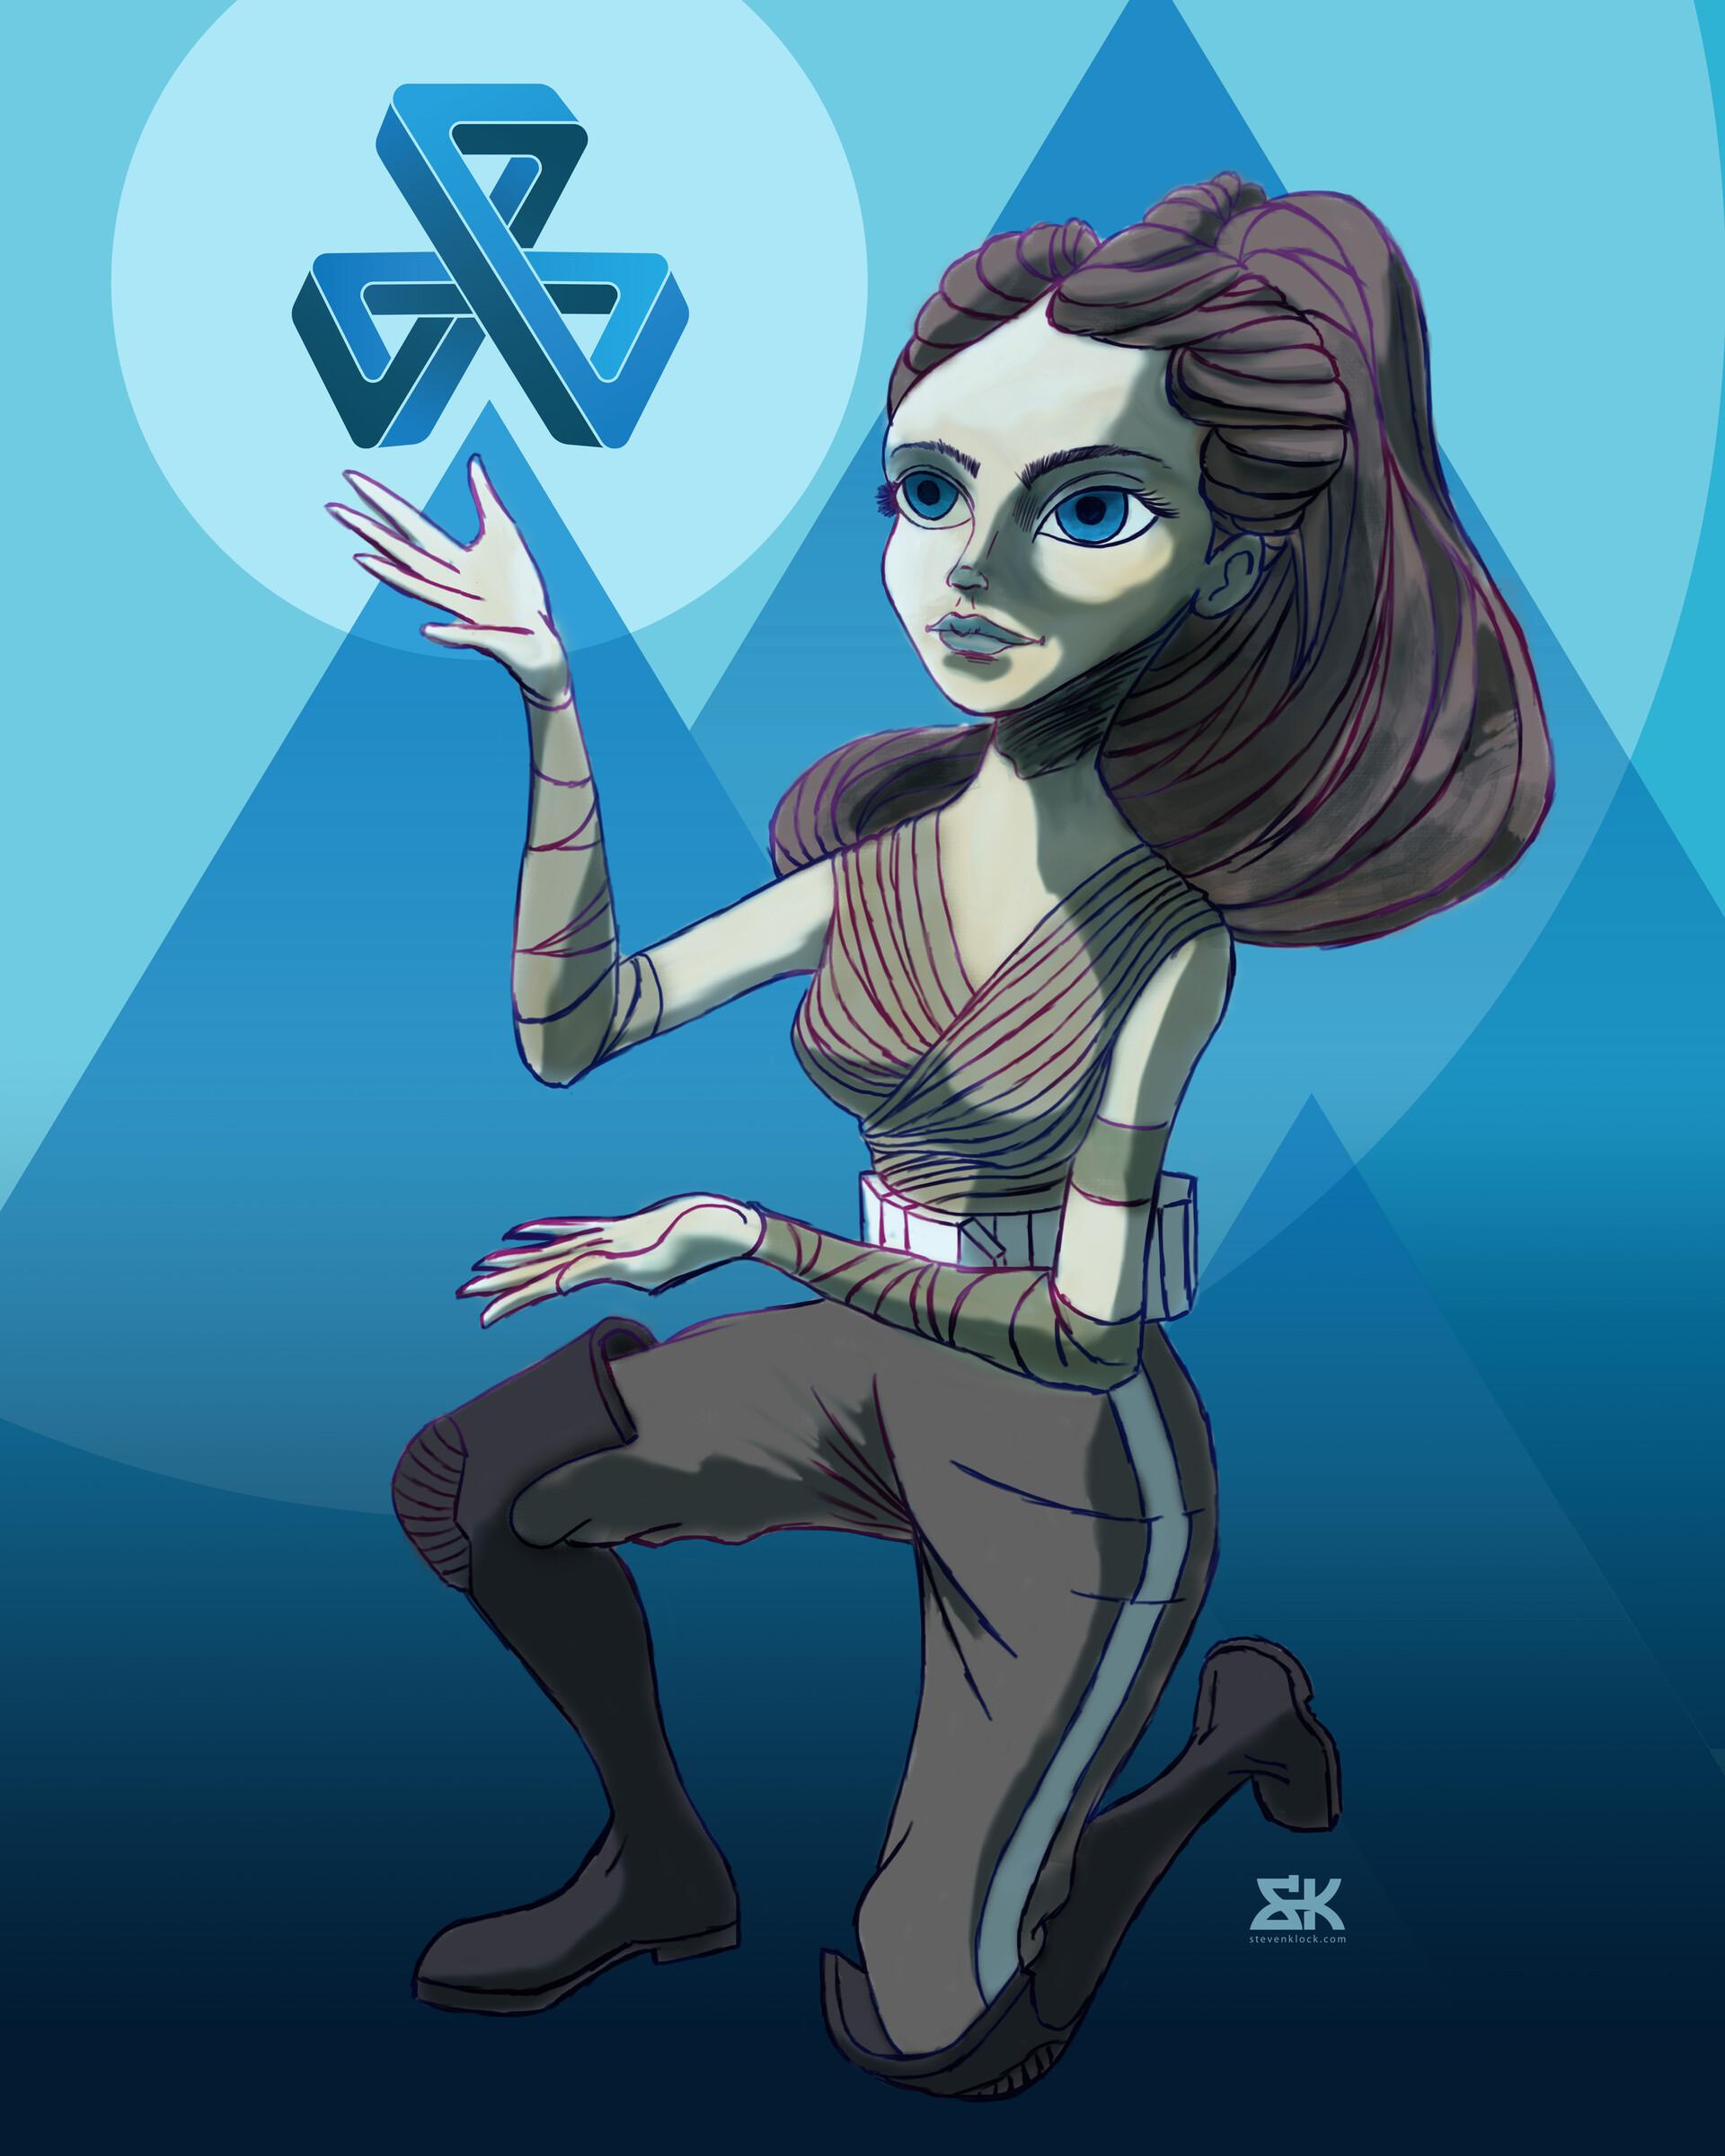 Tri Force Wielding Mobius Girl